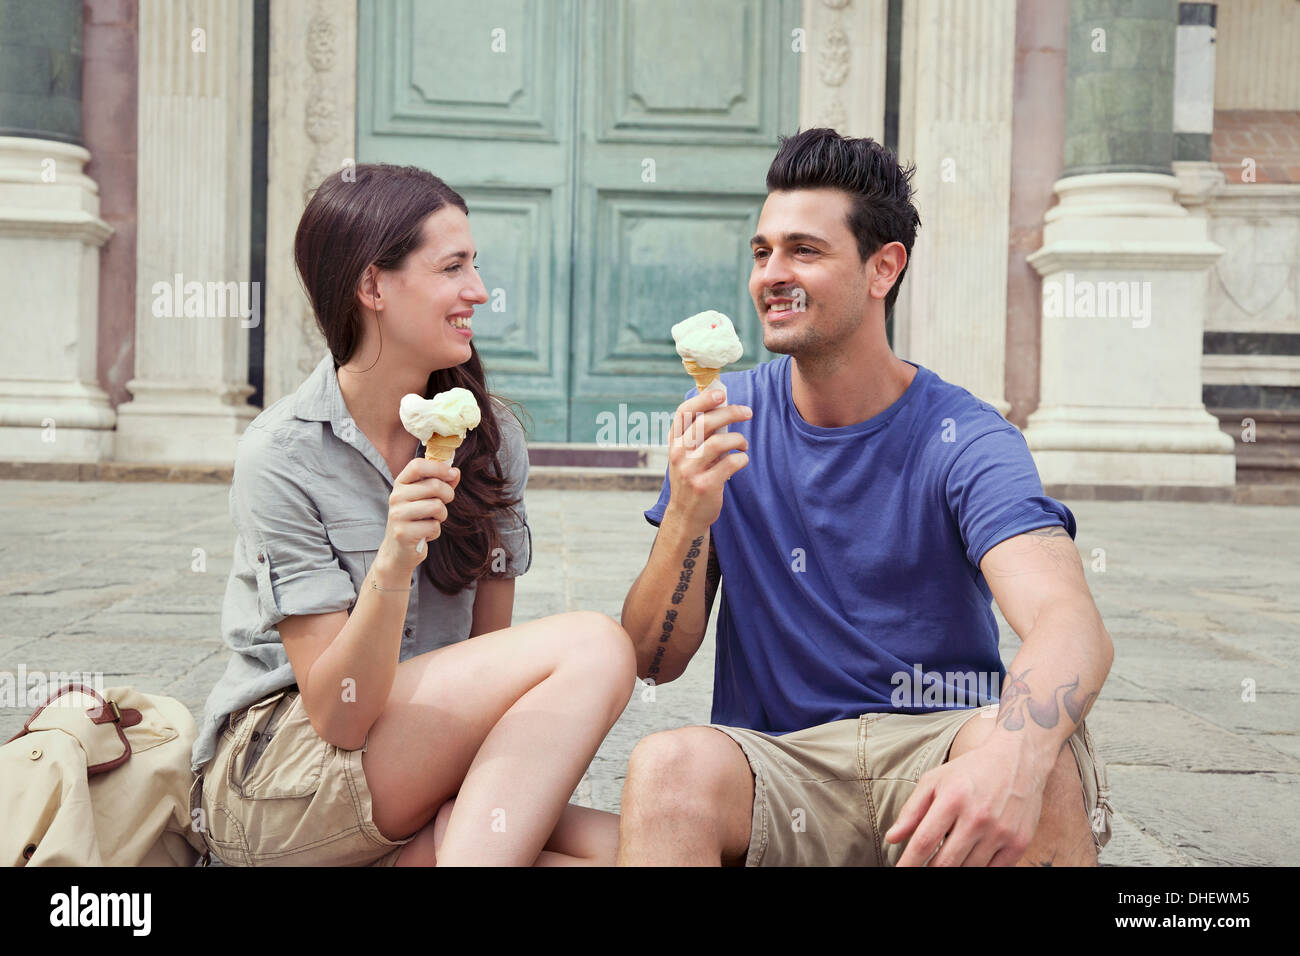 Couple eating ice creams, Santa Maria Novella square, Florence, Tuscany, Italy - Stock Image